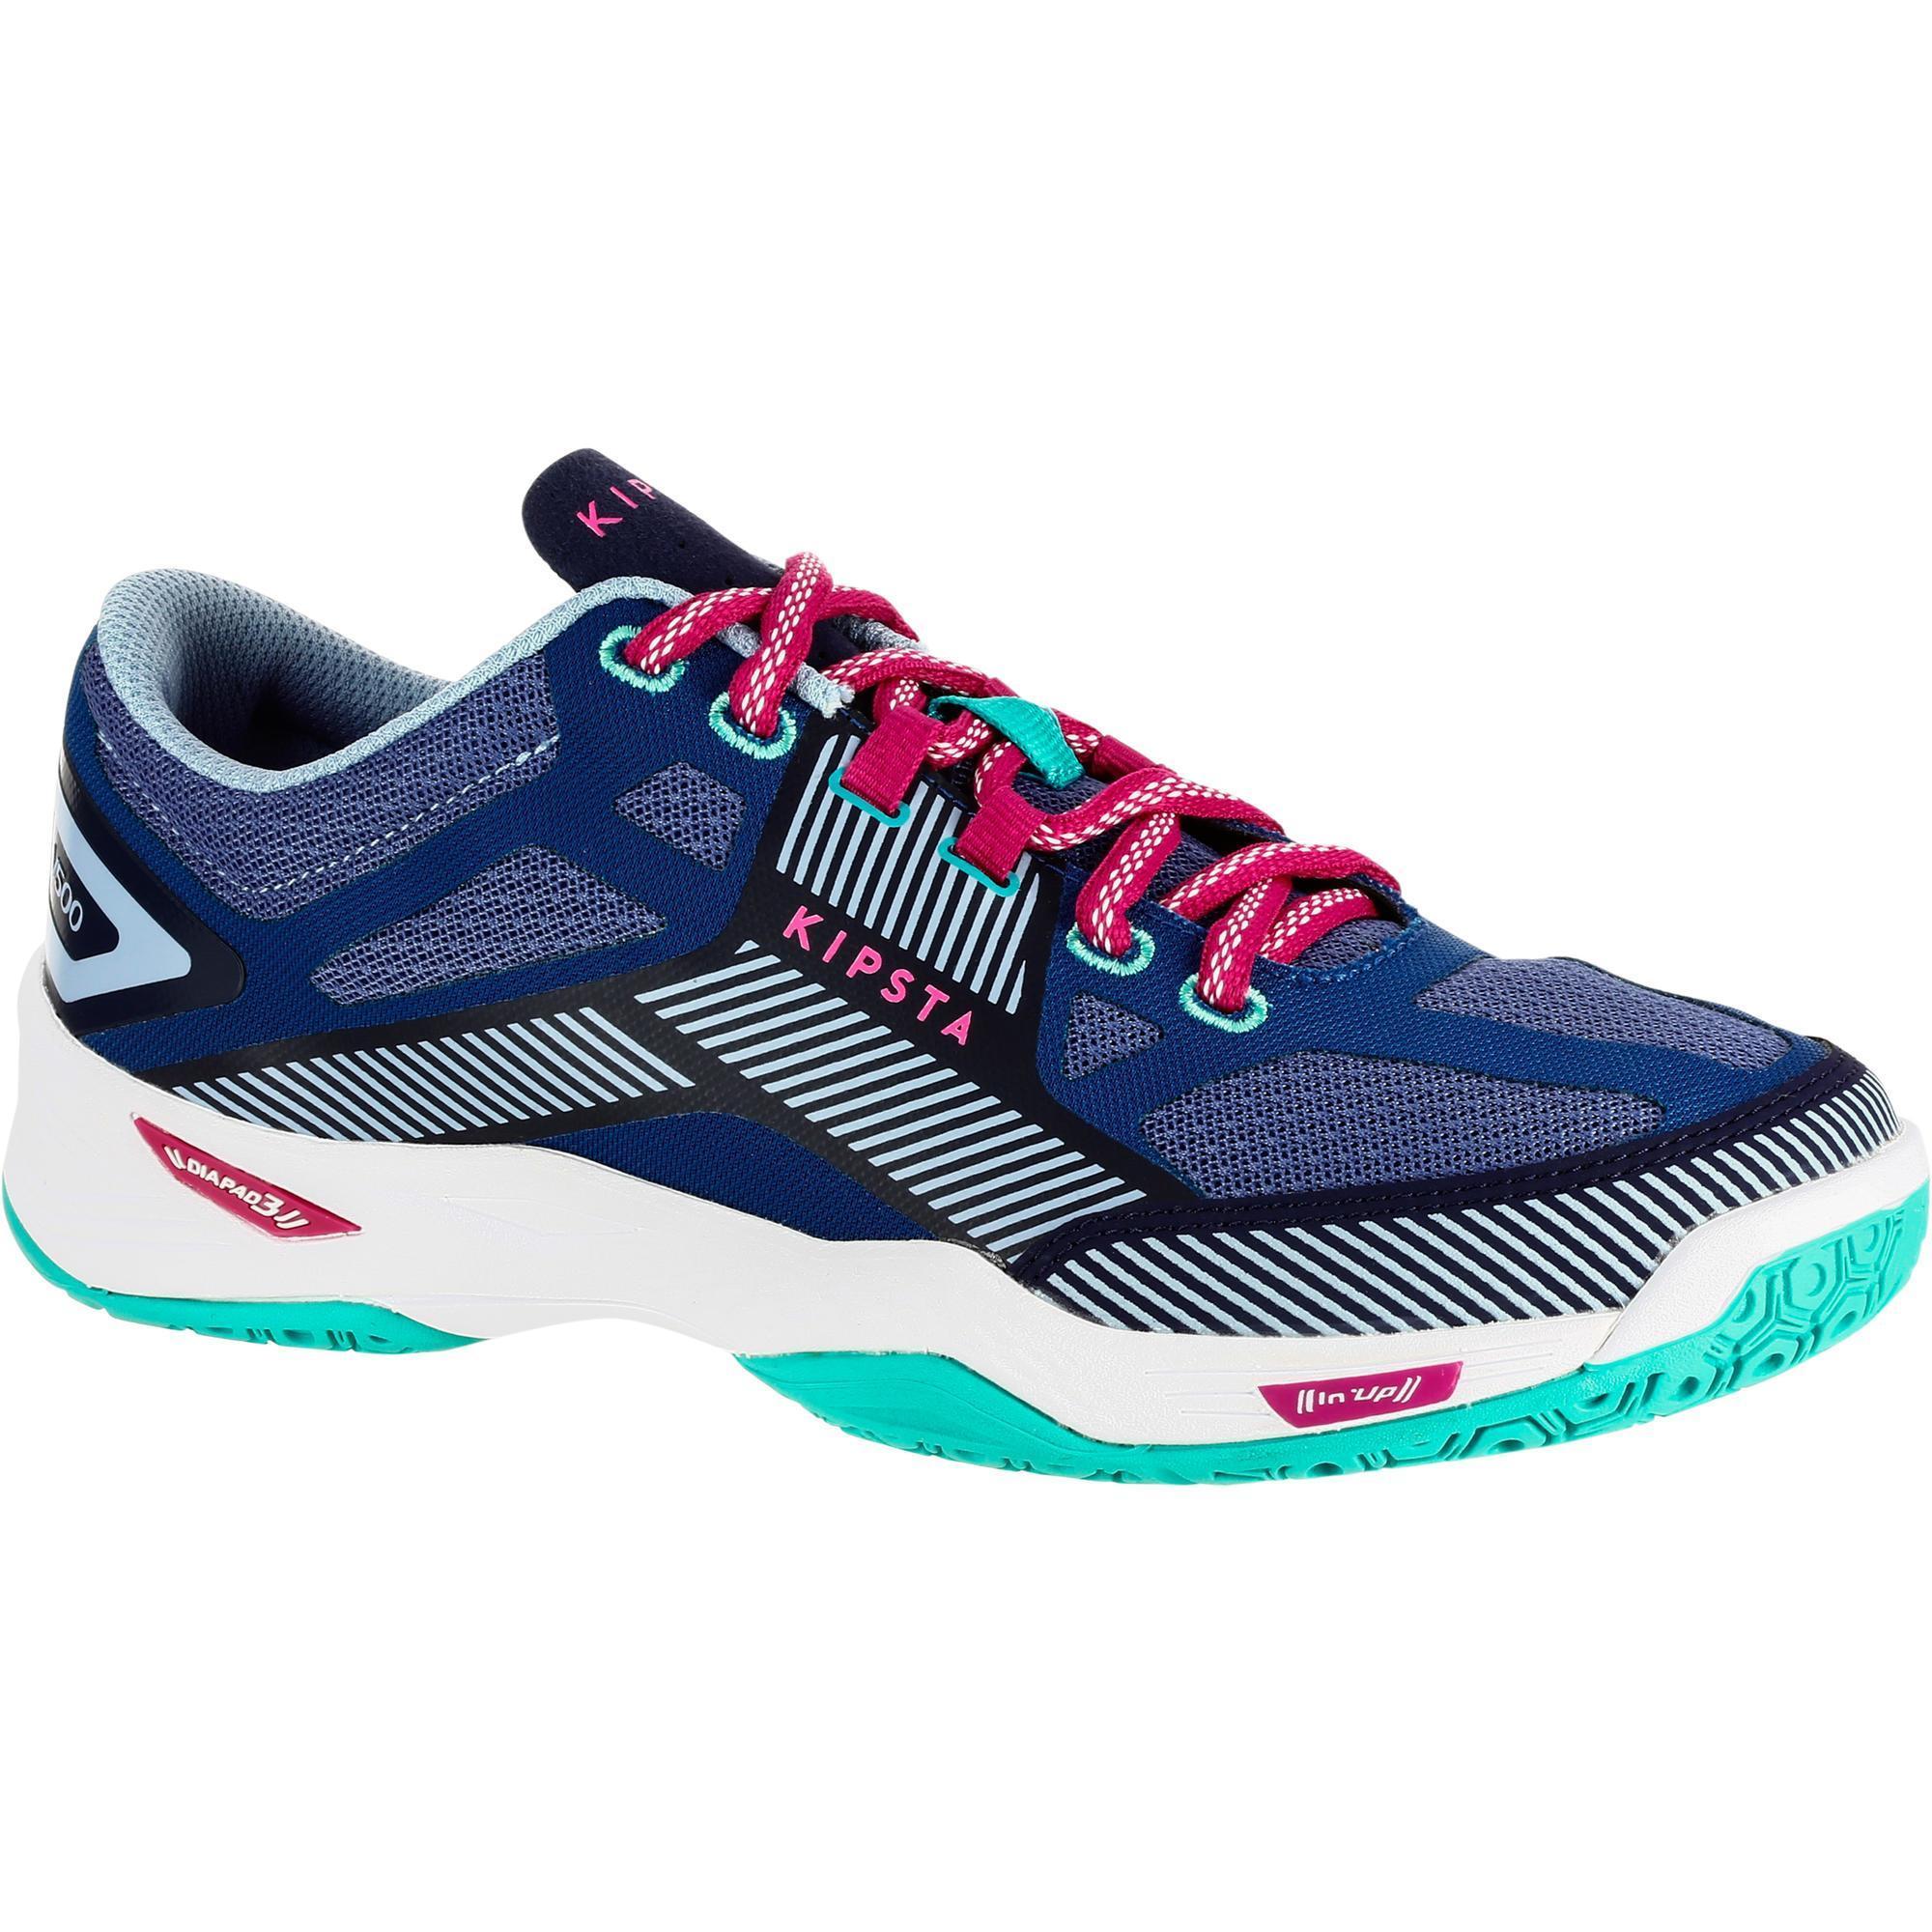 Allsix Volleybalschoenen dames V500 blauw